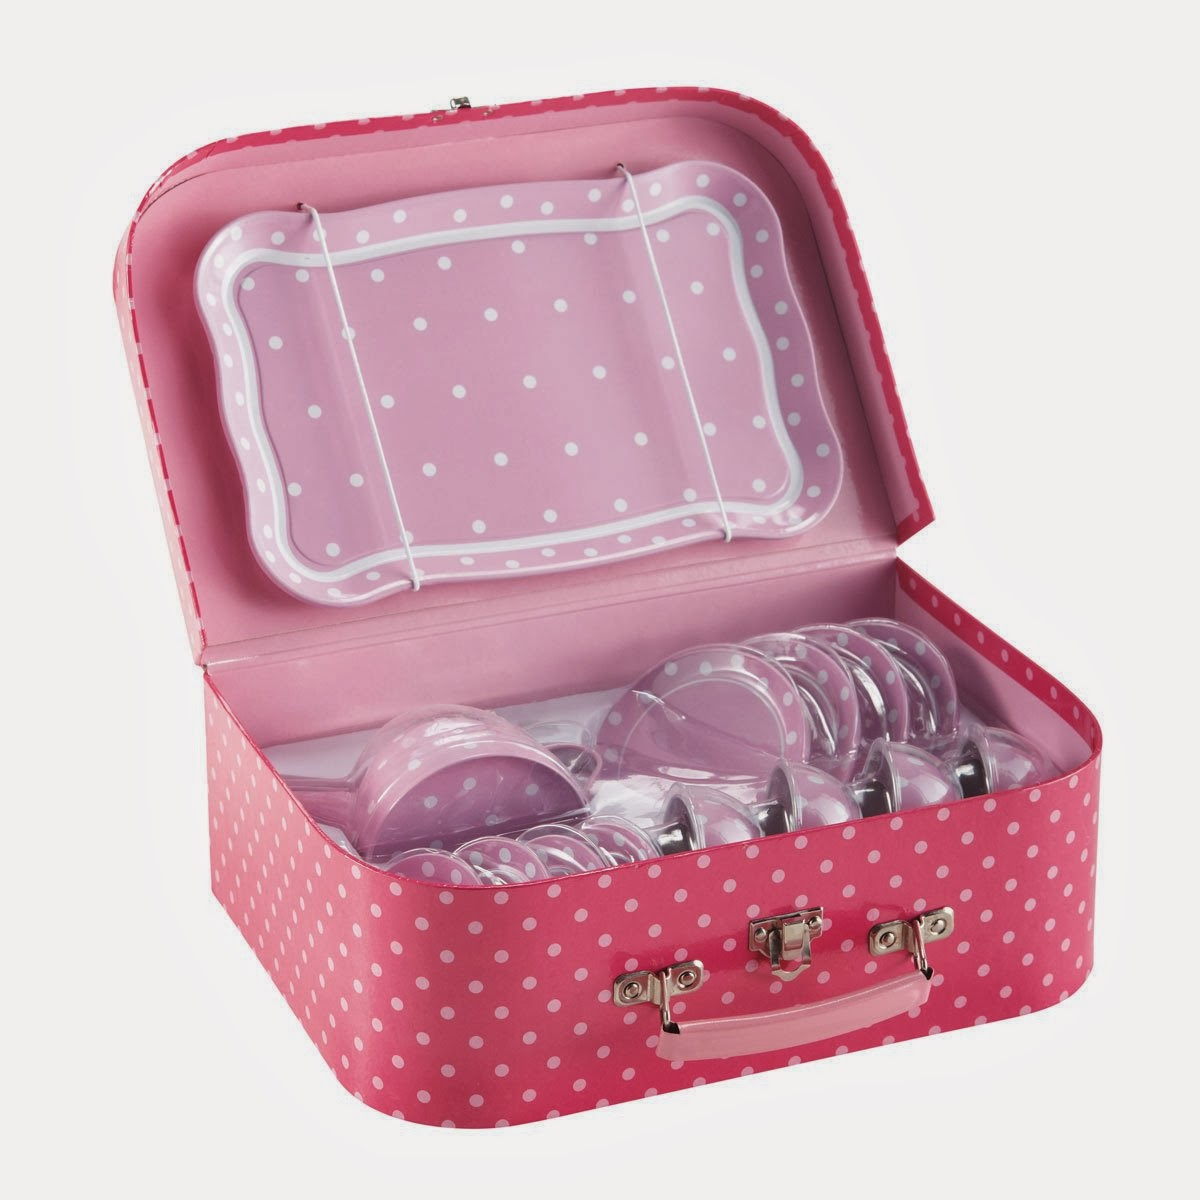 l 39 objet de la semaine dinette enfant tea time maison du monde madmoizelle cupcake blog. Black Bedroom Furniture Sets. Home Design Ideas